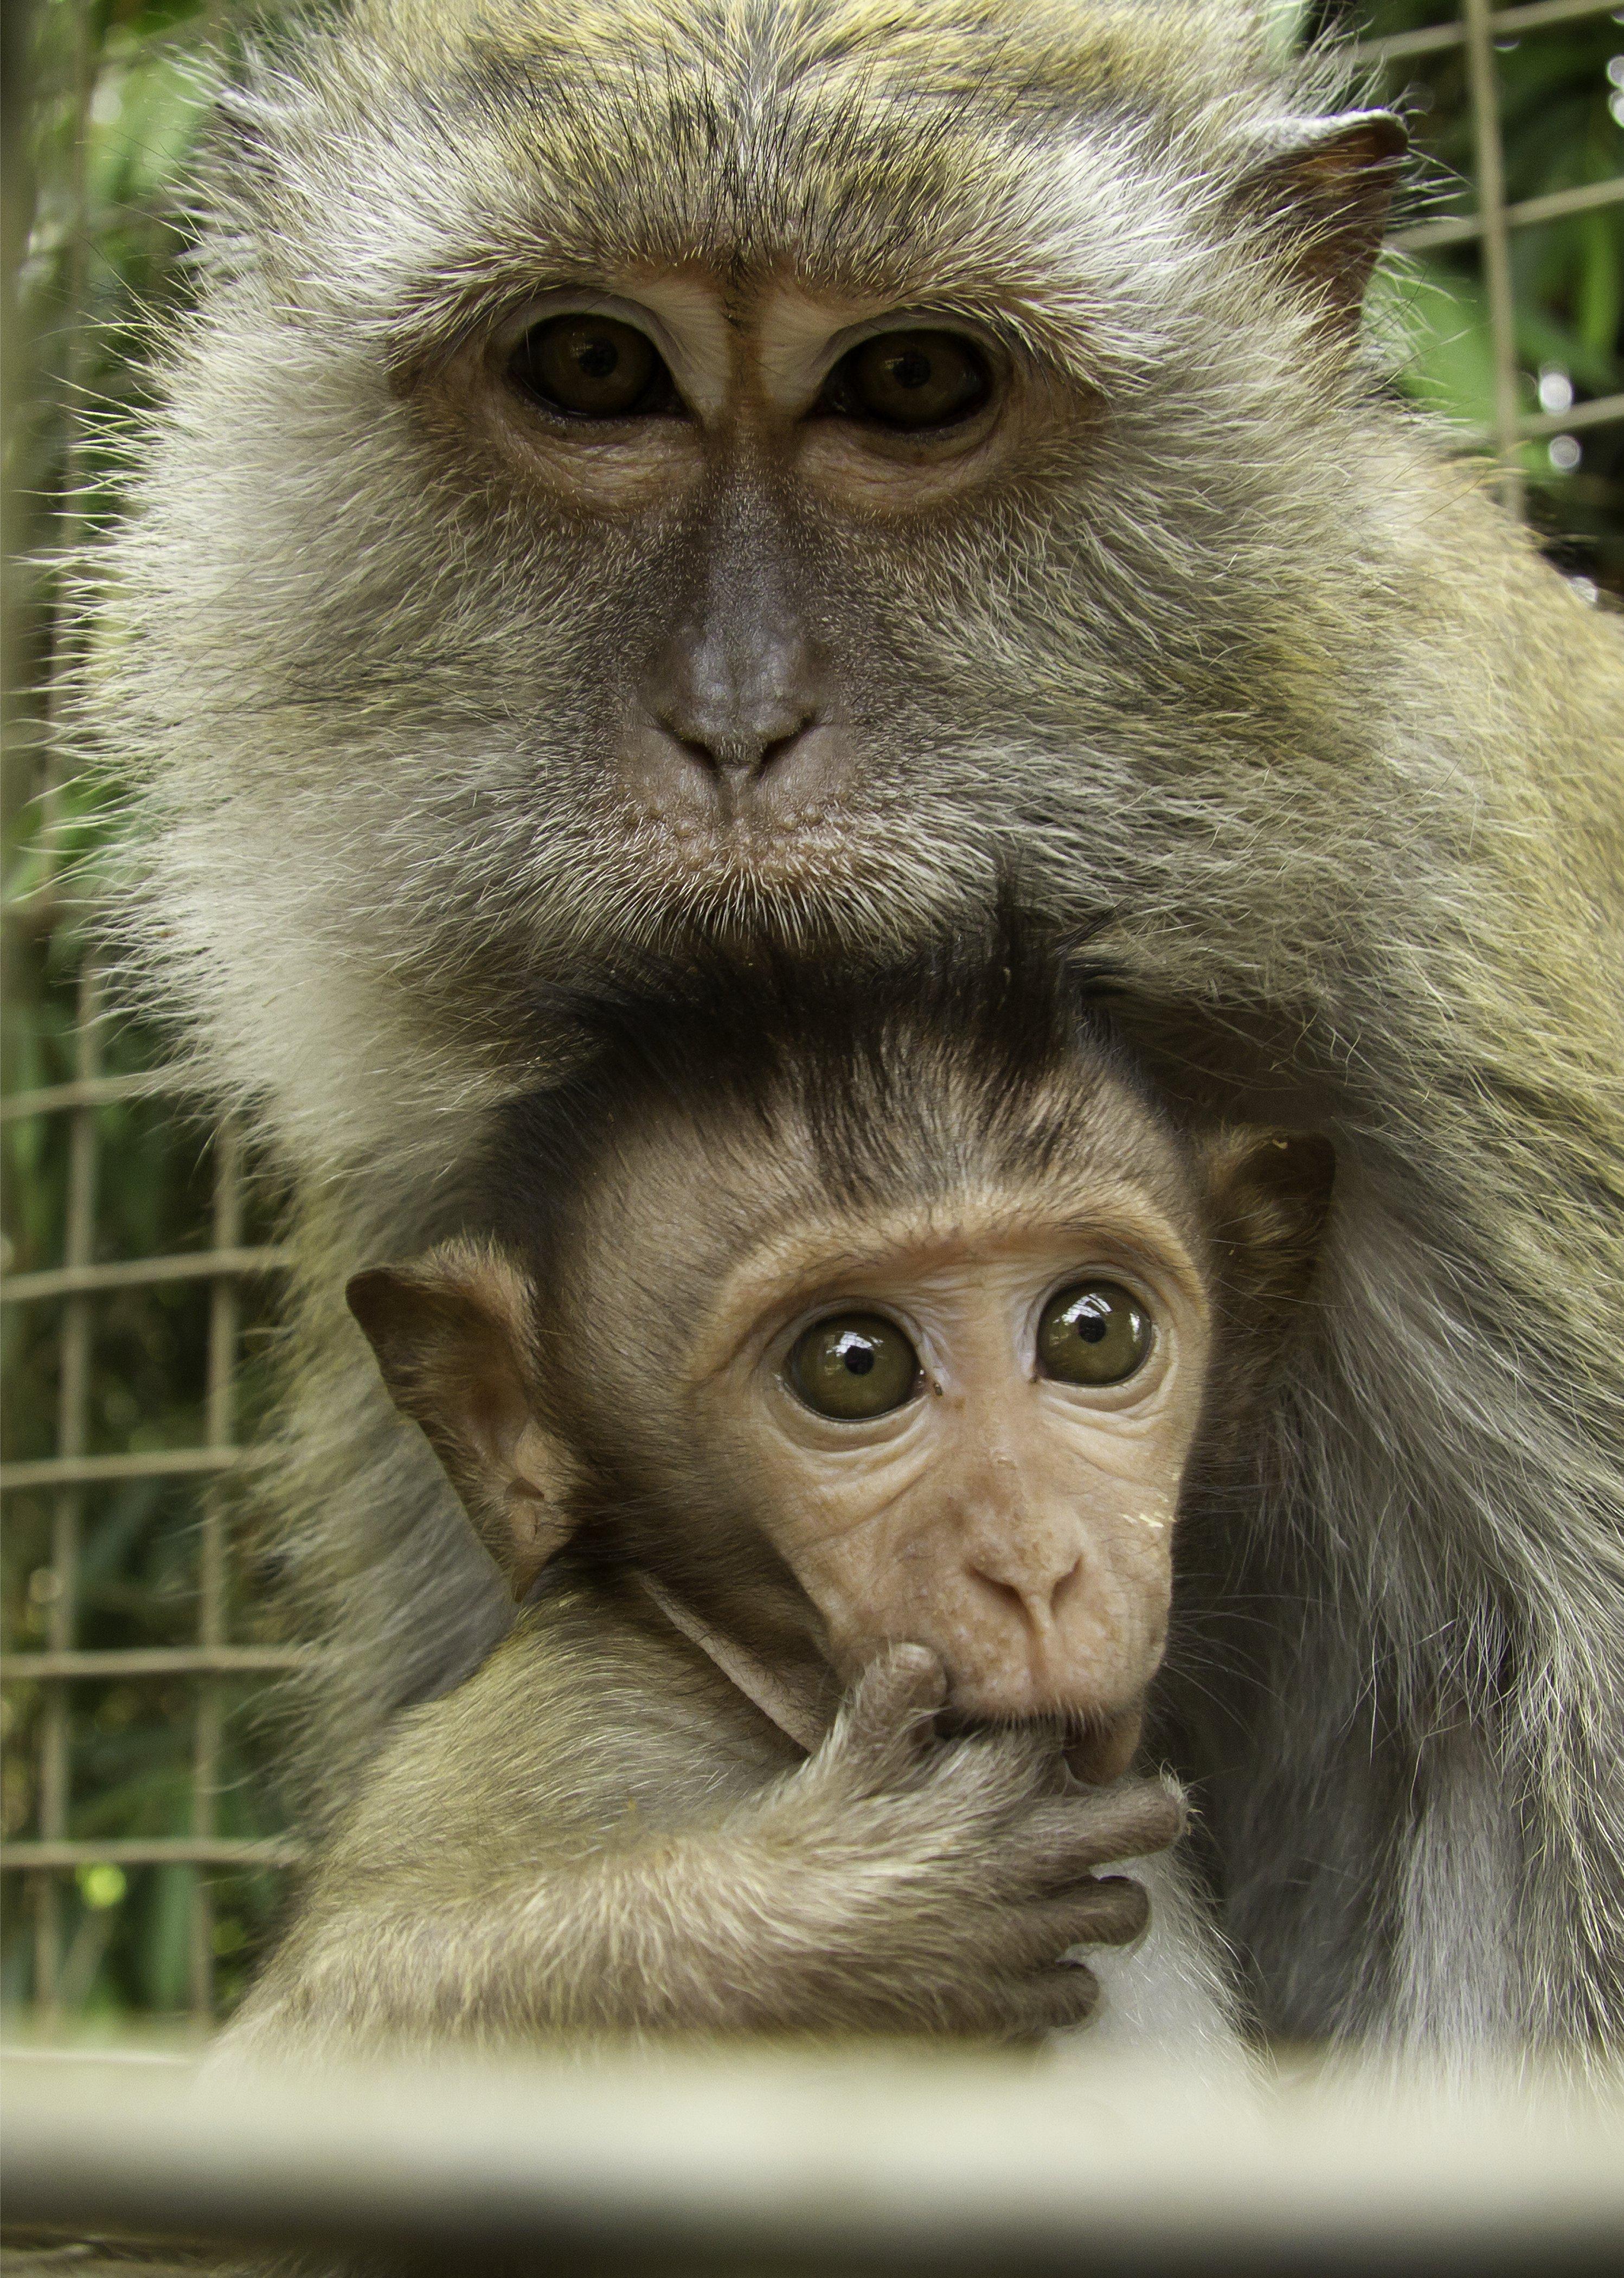 Macaque photo